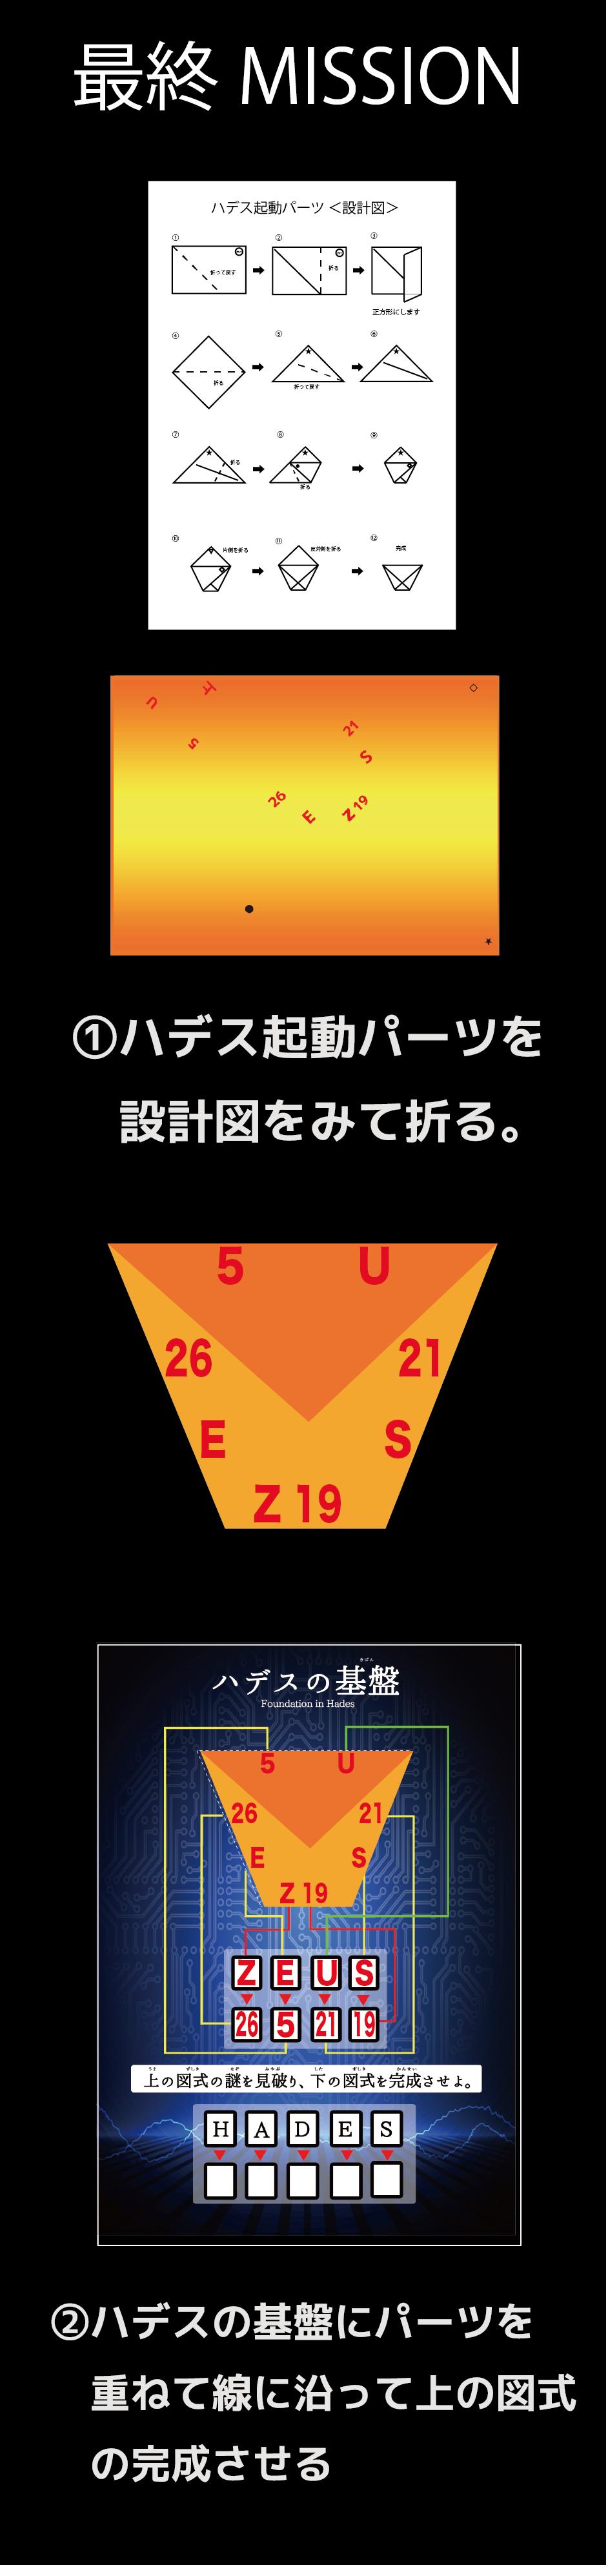 %e5%85%ac%e6%bc%94-%e8%a7%a3%e7%ad%94-08